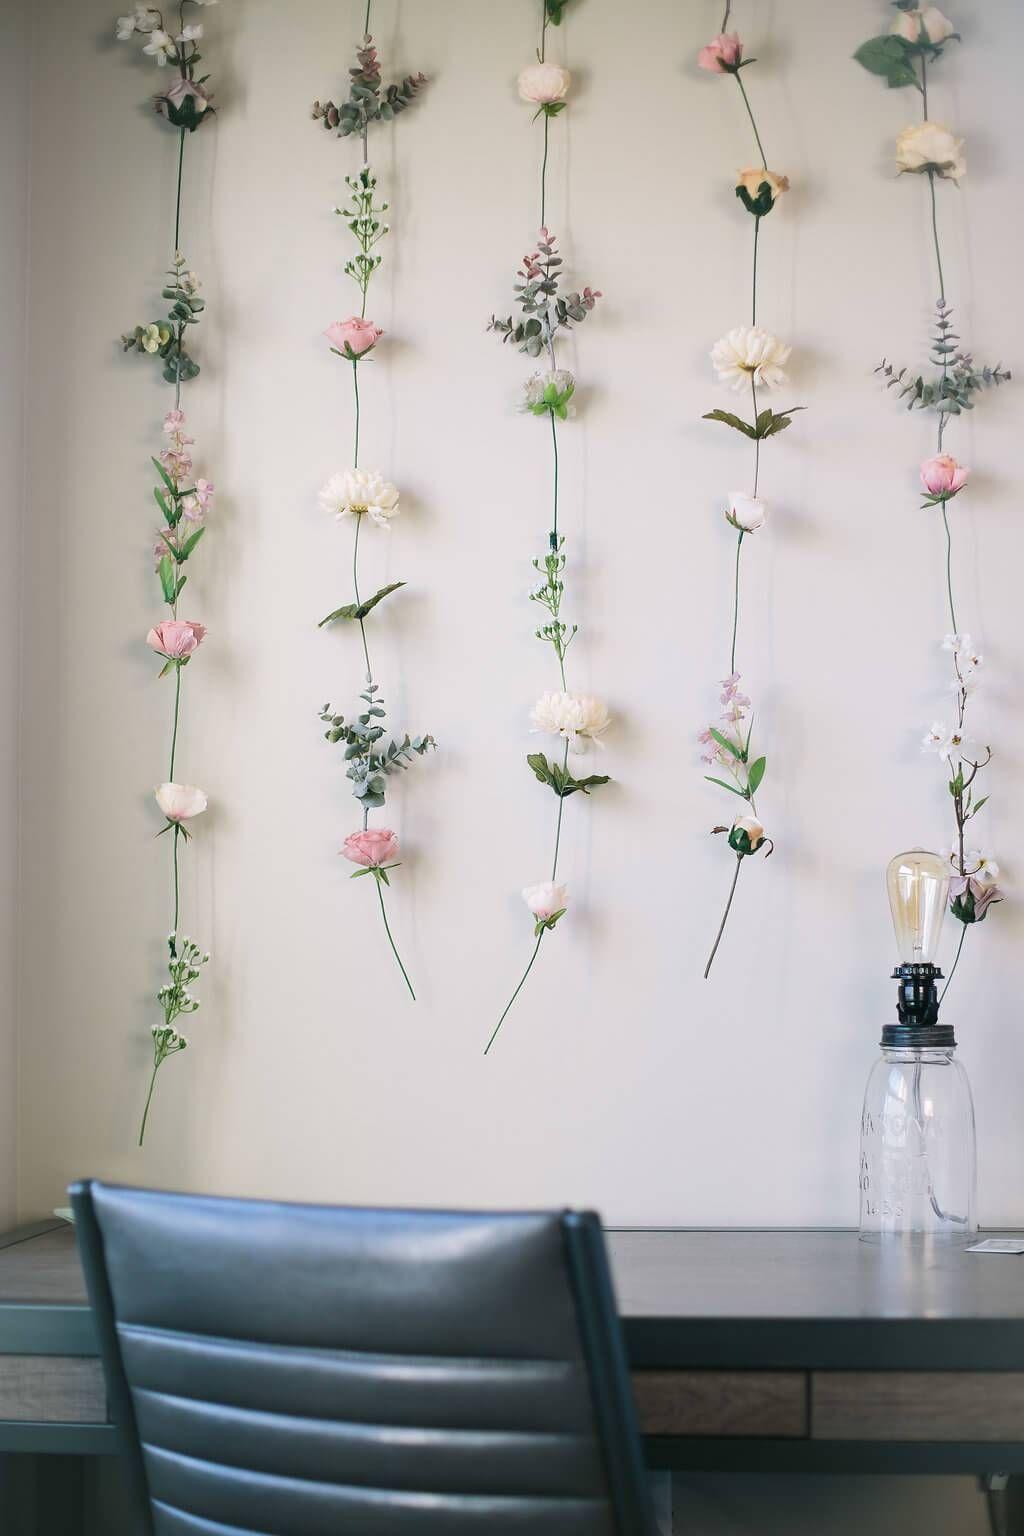 Diy flower wall diy flower wall flower wall aesthetic